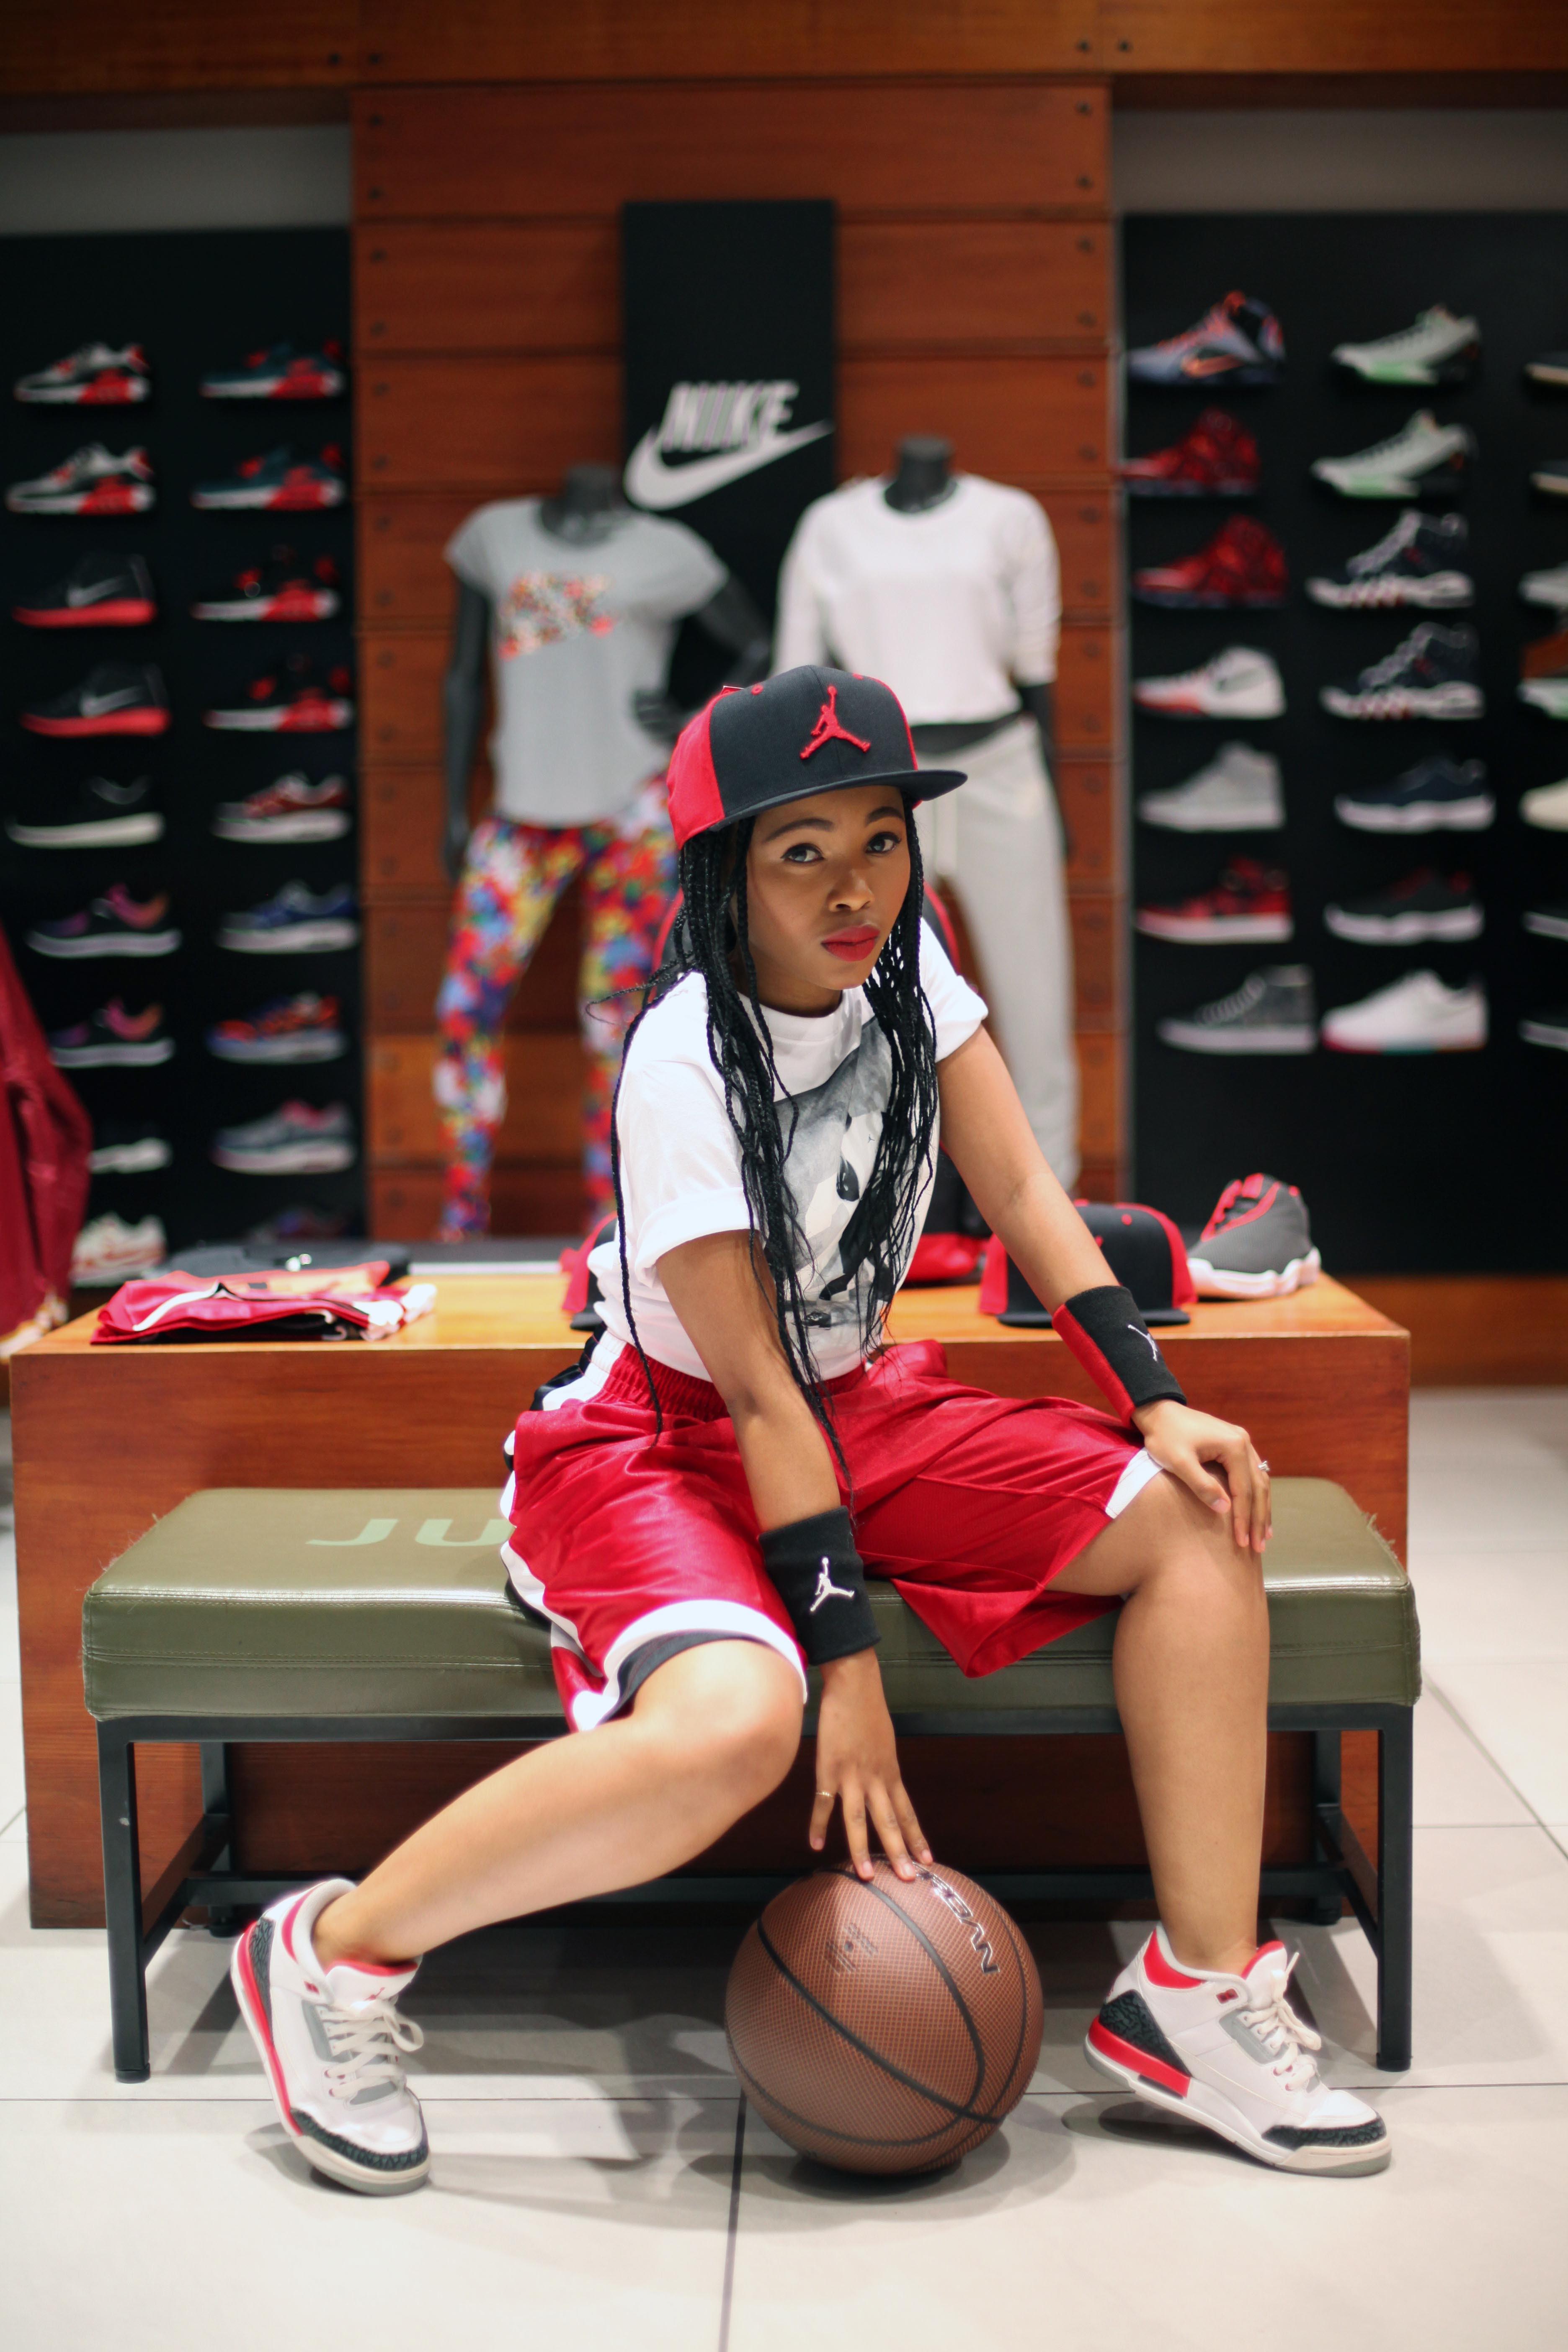 Shesha Nike|Jordan – bevstars